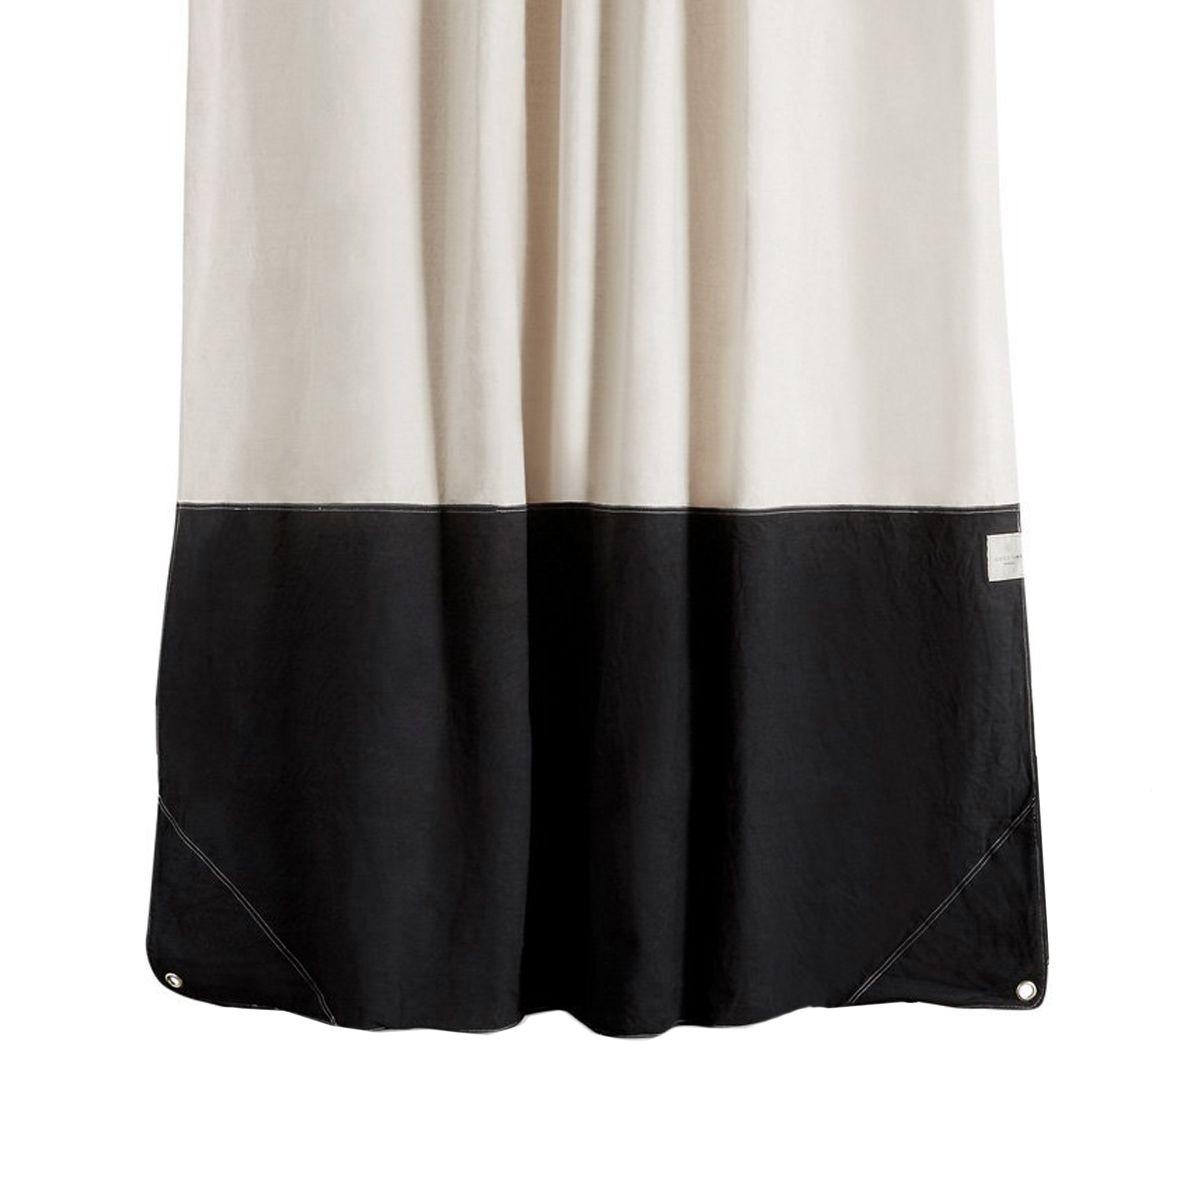 The Orientu0027 Canvas Shower Curtain   TRNK